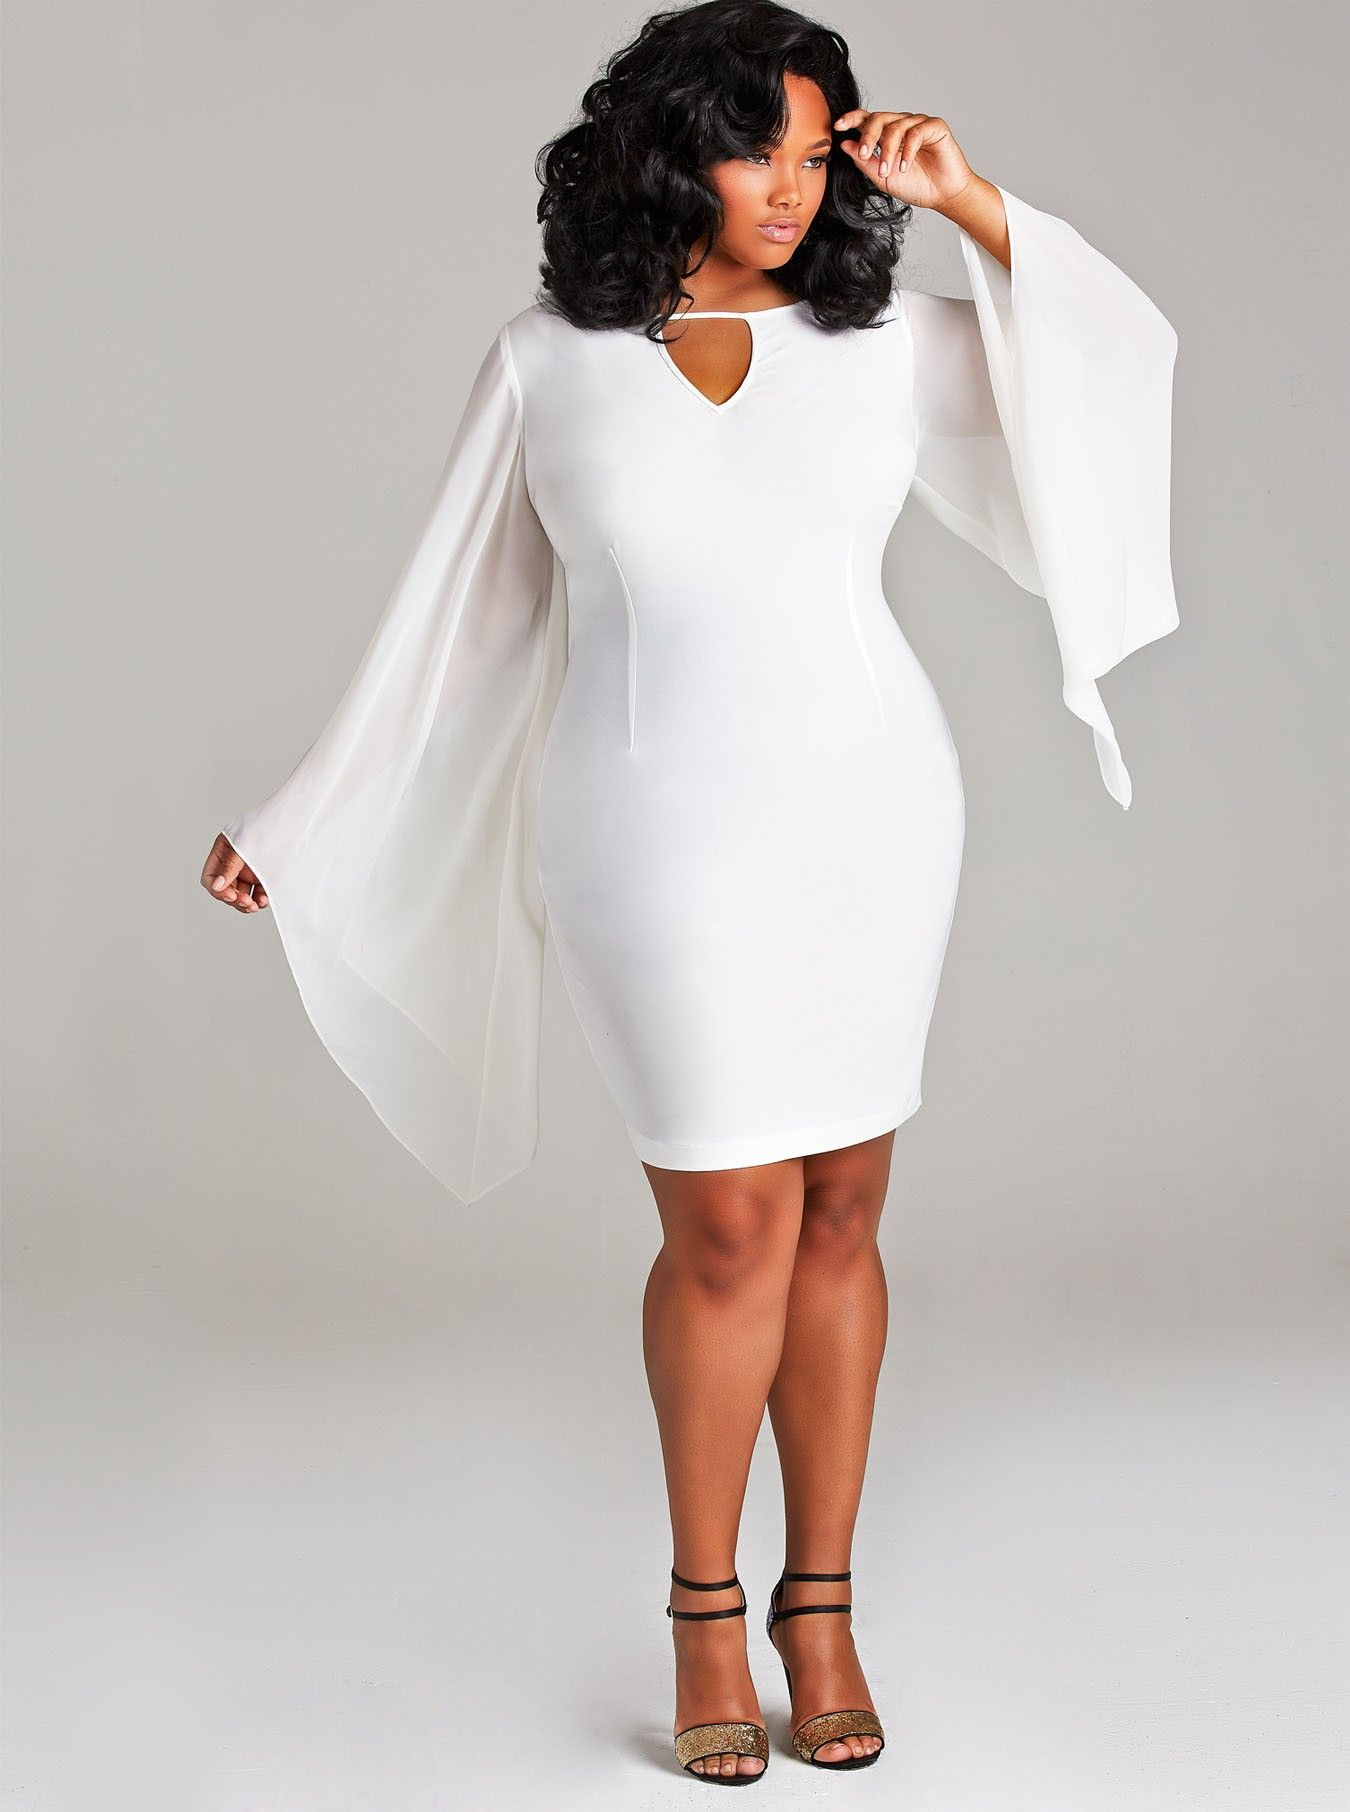 Monif The Simone Chiffon Sleeve Dress Has All The Romance Of A